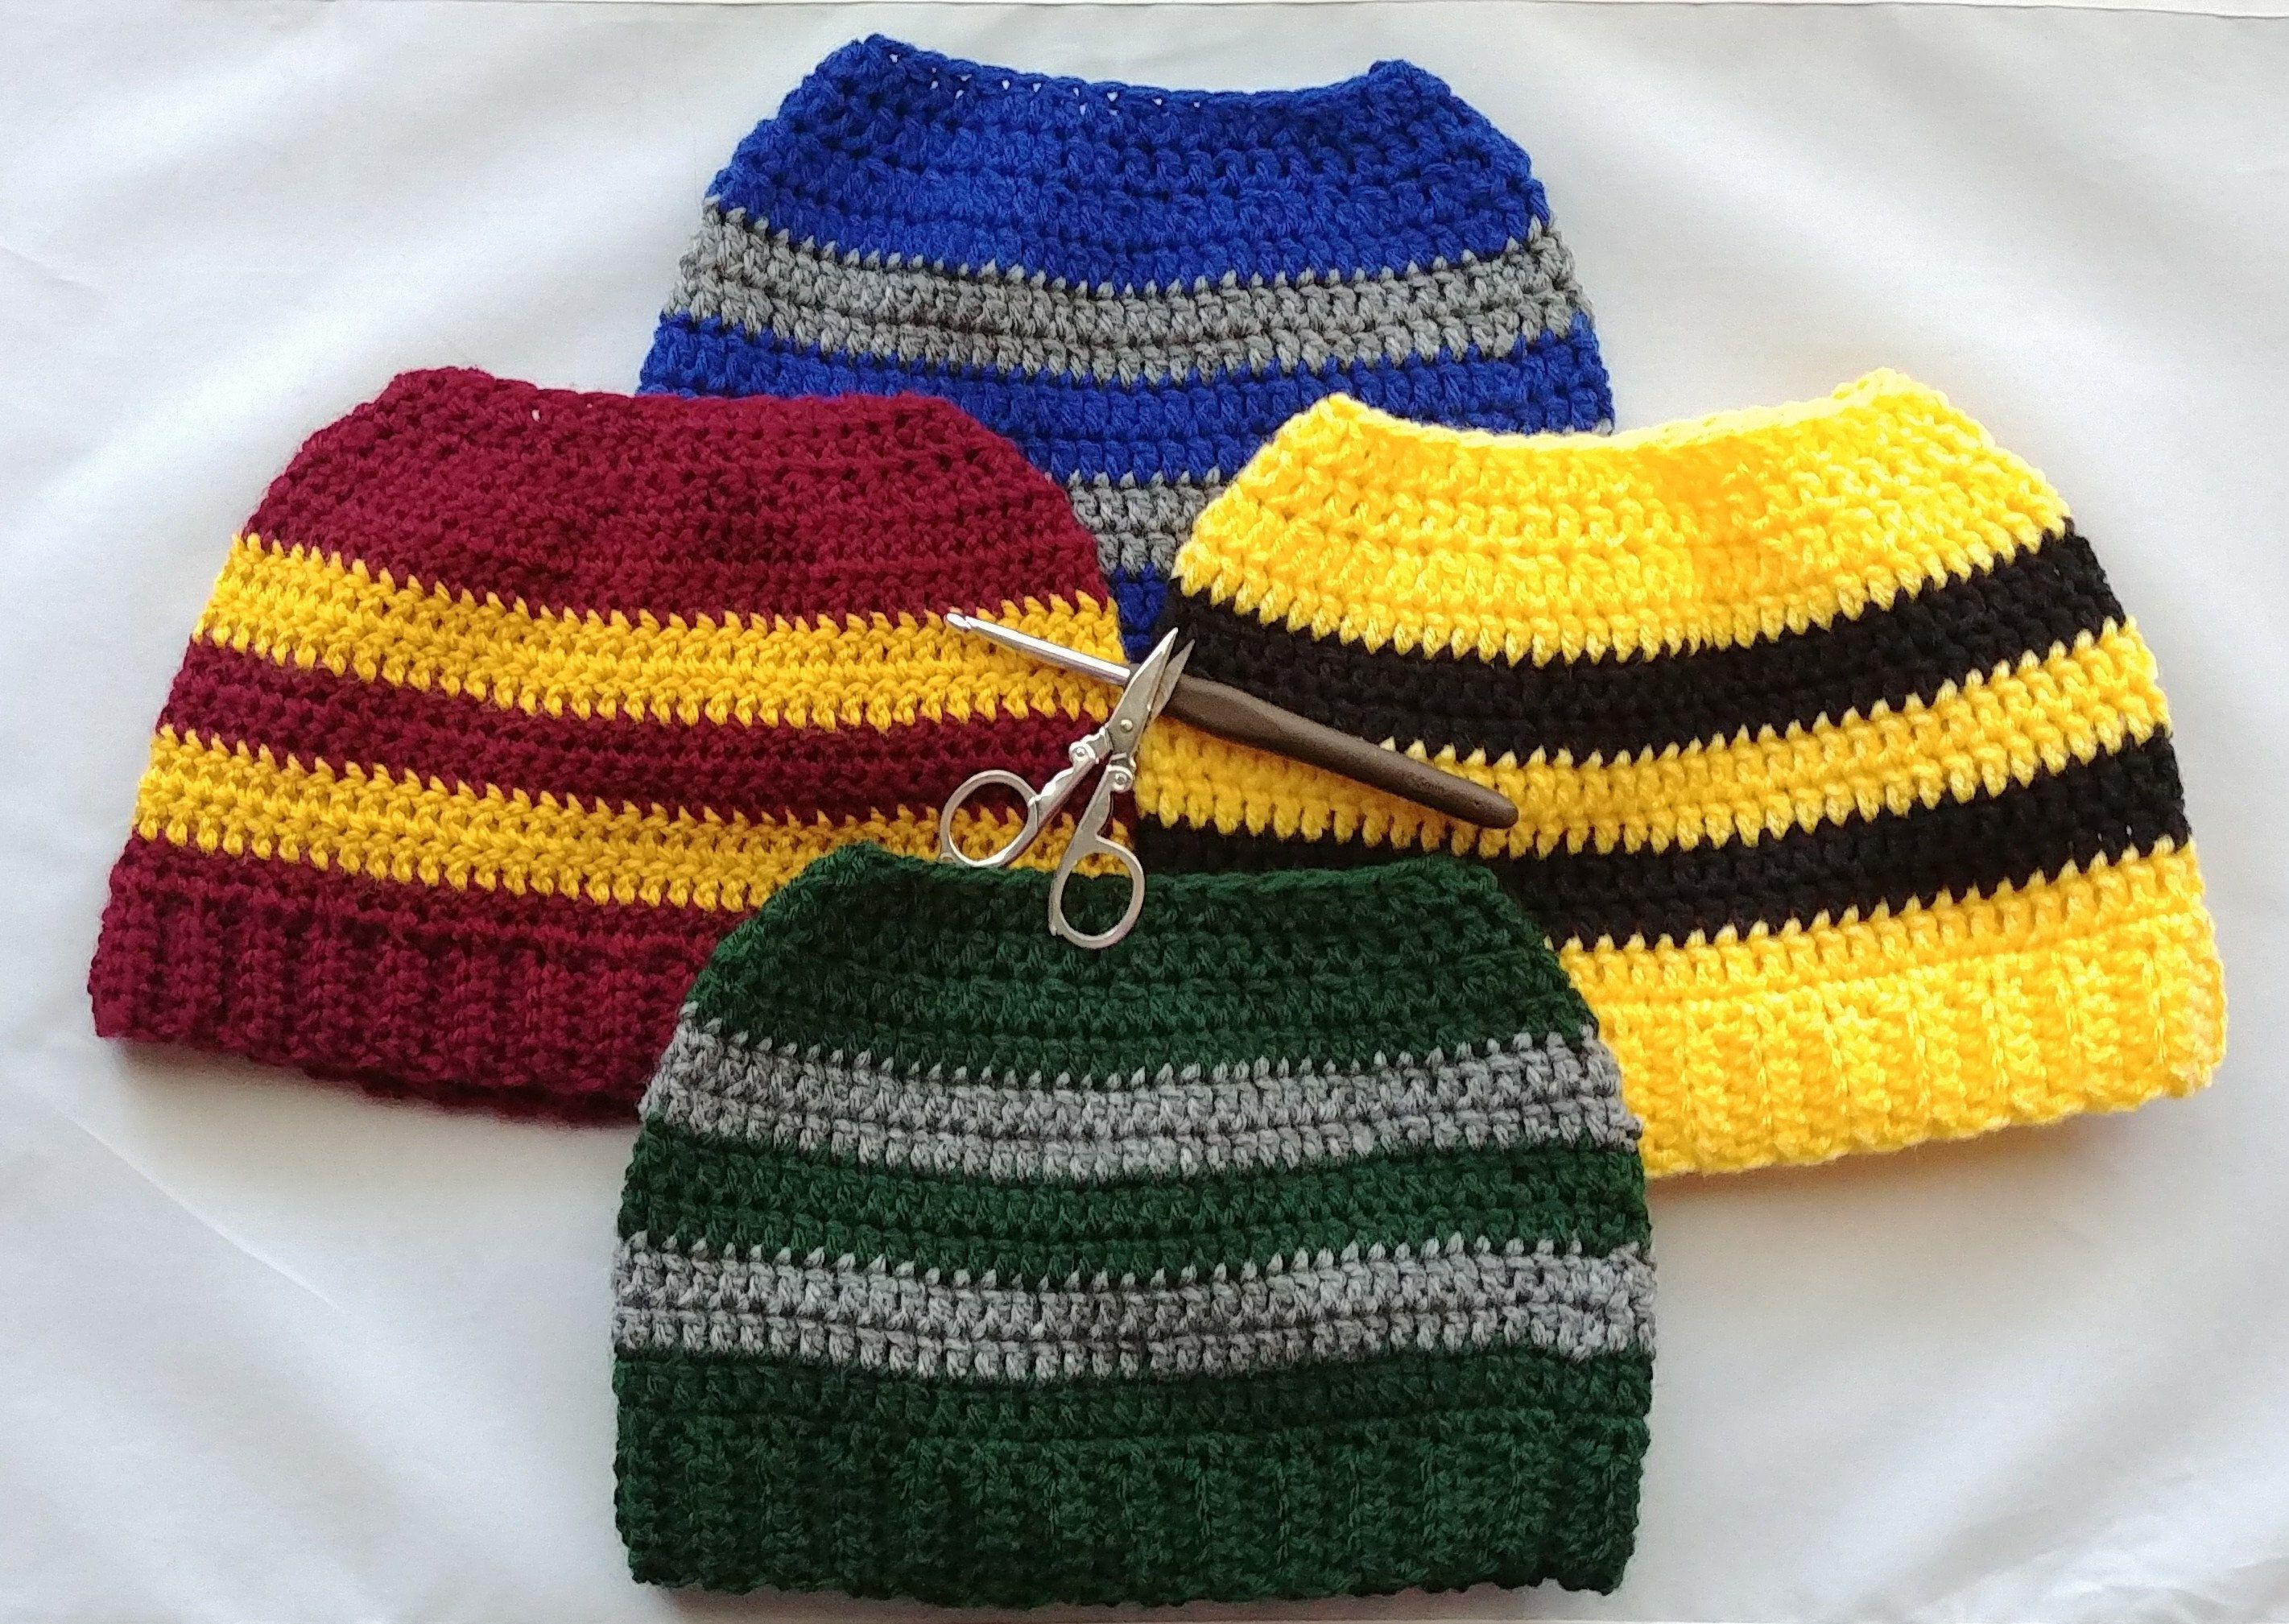 Harry Potter Inspired Crochet Messy Bun Hats Harrypotter Crochet Messybunhat Ponytailhat Gryffindo Harry Potter Crochet Harry Potter Scarf Ravenclaw Scarf